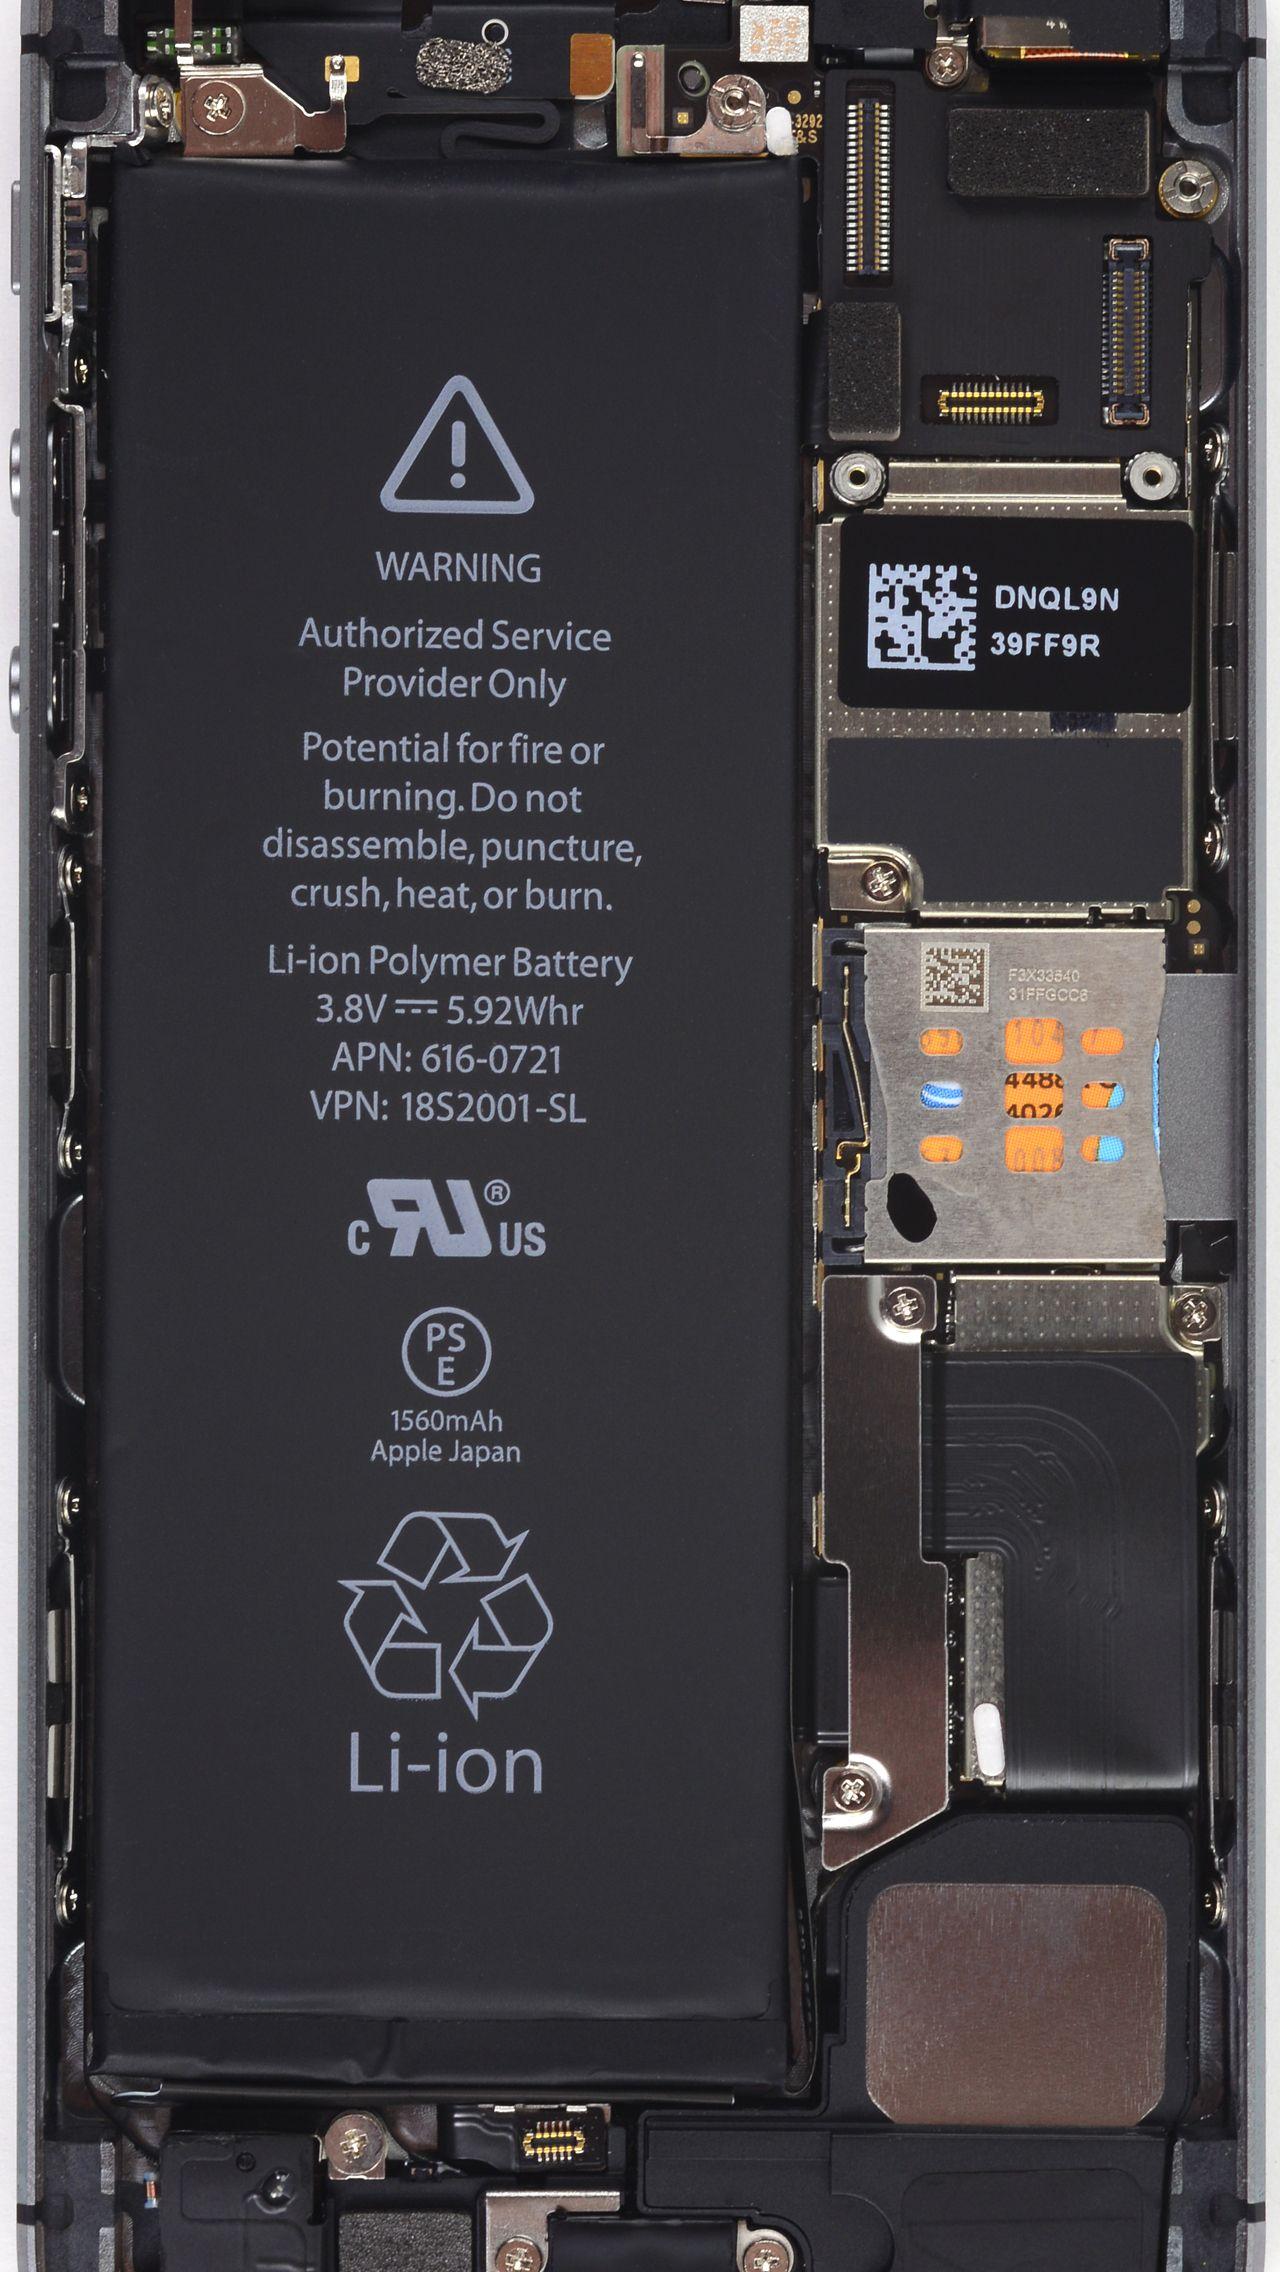 Fqpnecwzj6yqwvgx 1 280 2 272픽셀 Iphone Wallpaper Ponsel Iphone 5s